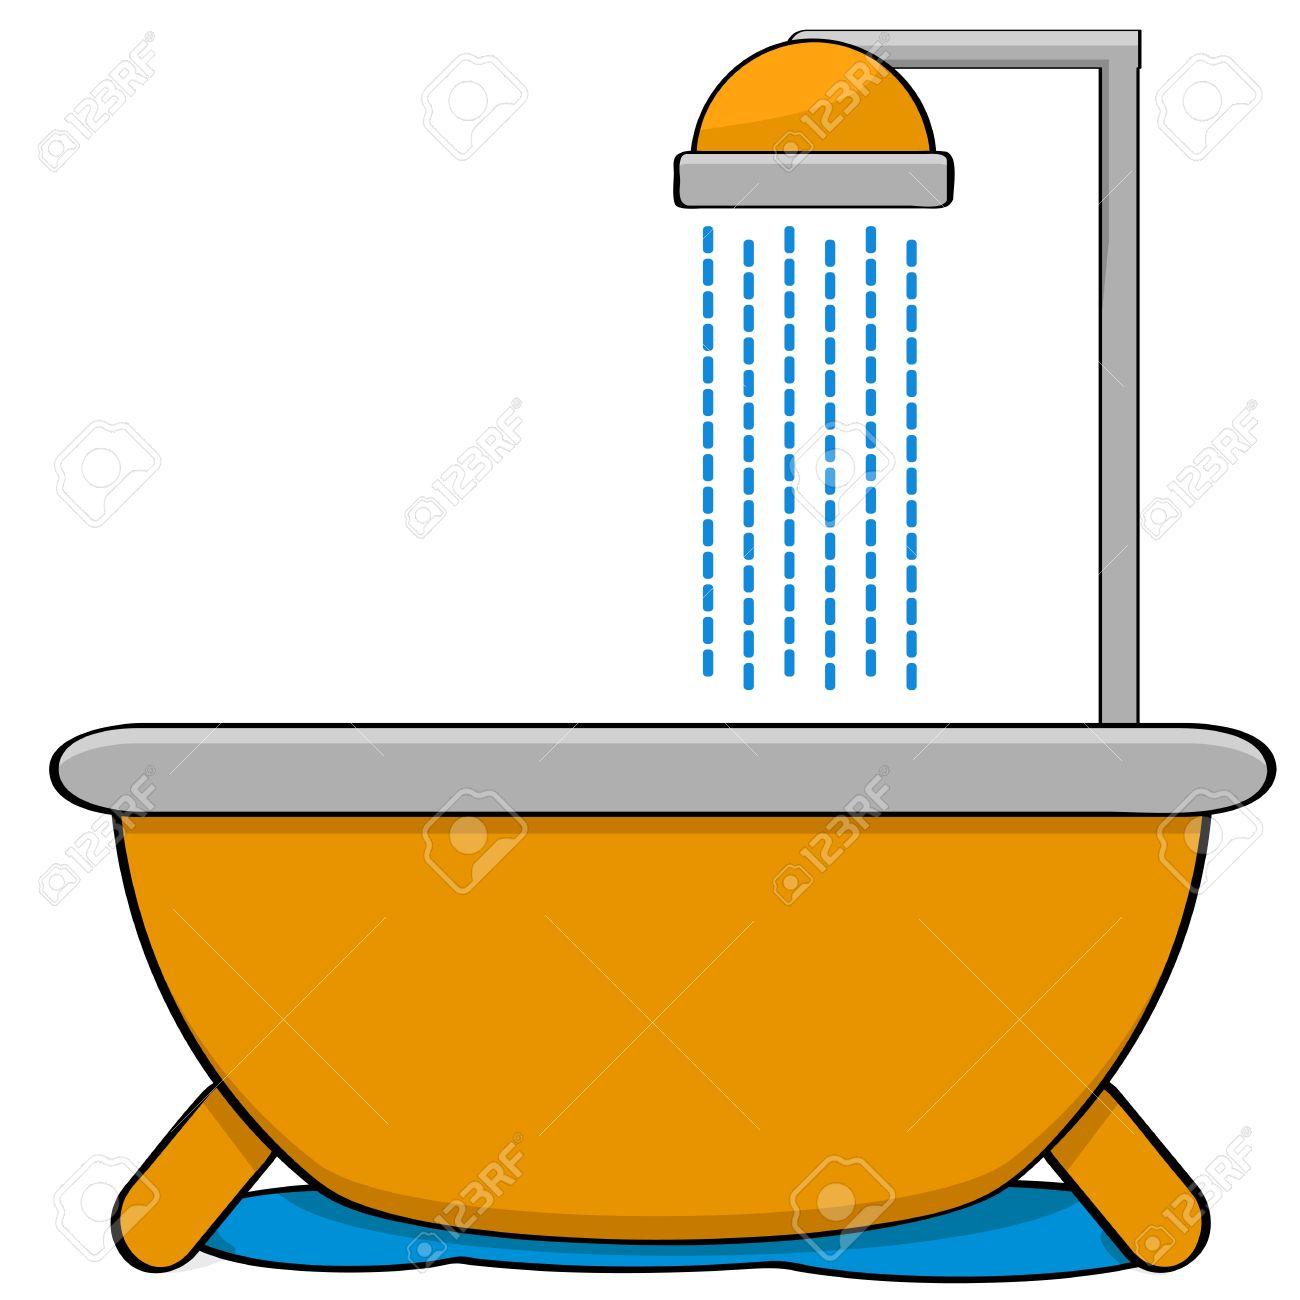 bathtub cartoon. Cartoon illustration showing a bathtub with shower head Stock Vector  16693560 Illustration Showing A Bathtub With Shower Head Royalty